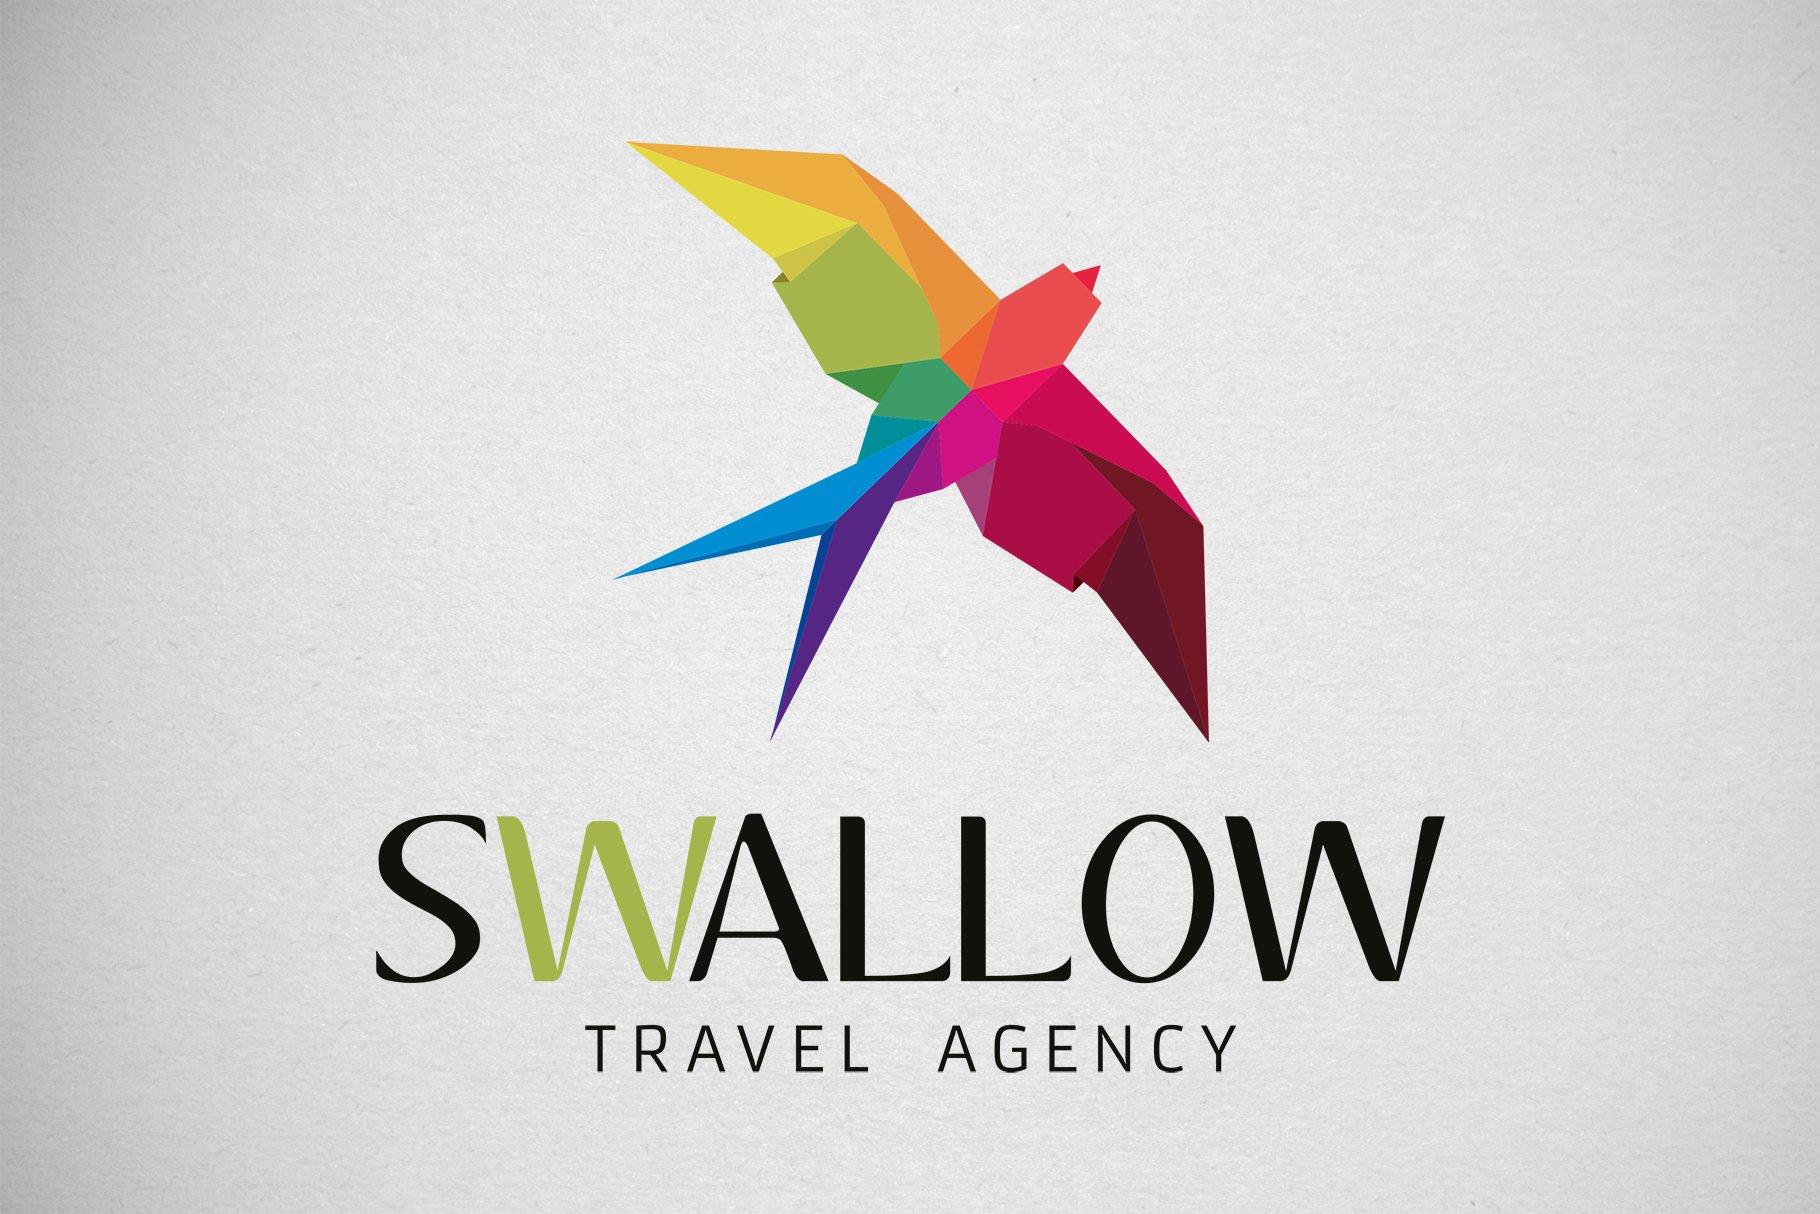 swallow vector logo creative illustrator templates creative market swallow vector logo creative